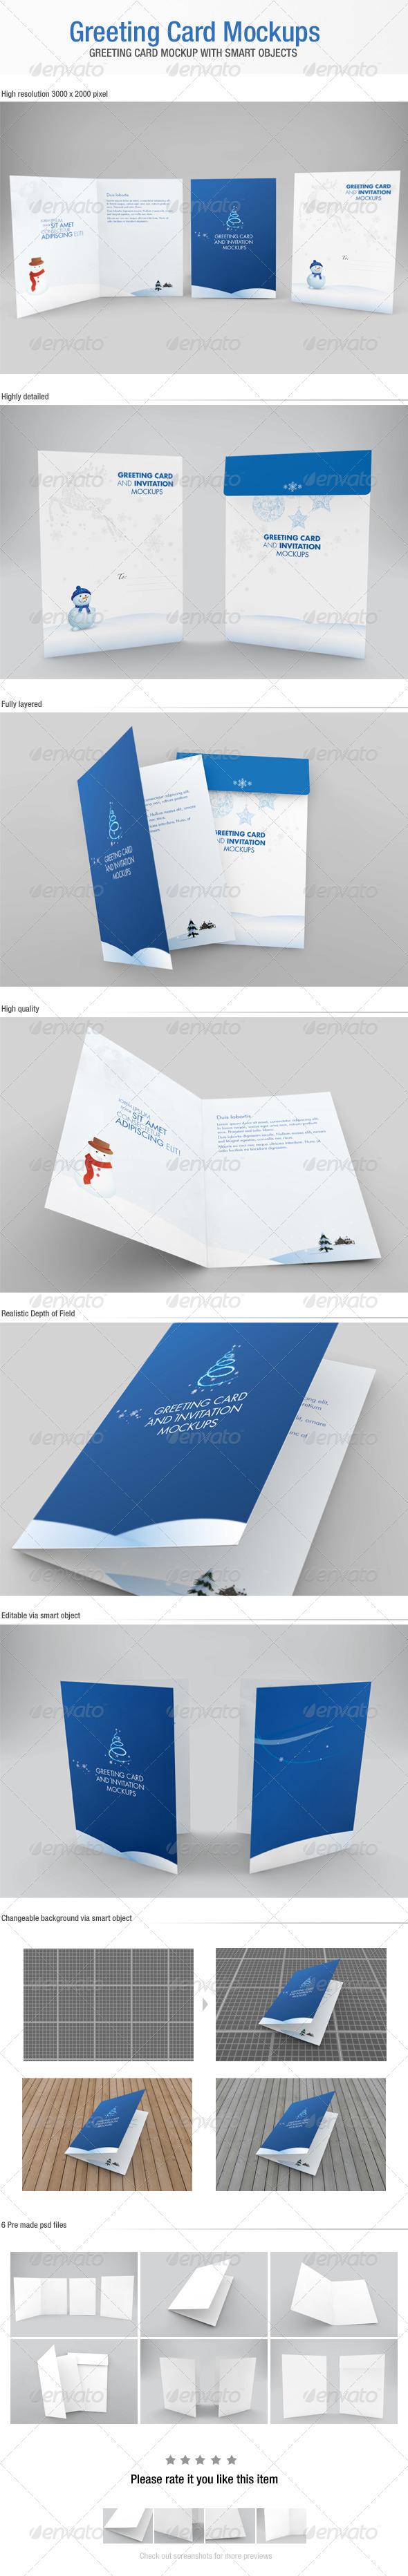 GraphicRiver Greeting Card Mockups 5922841